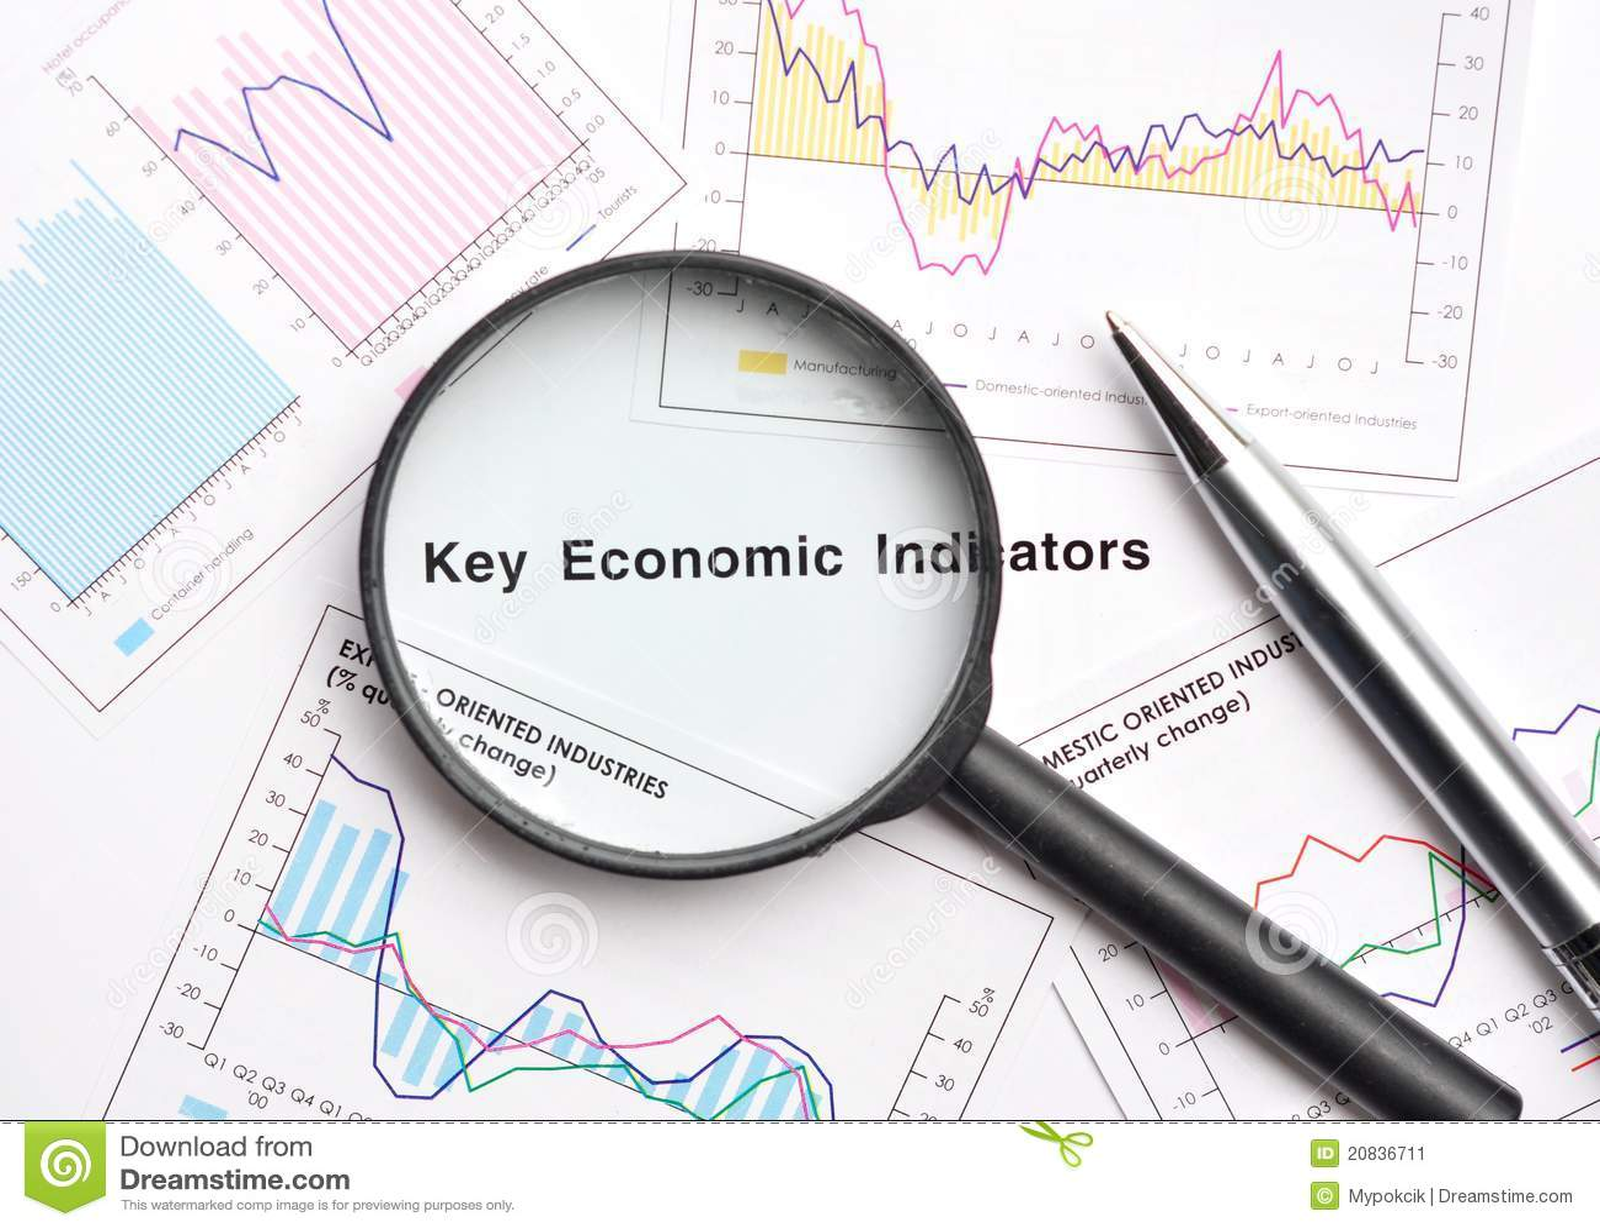 Economy industry company analysis of glass